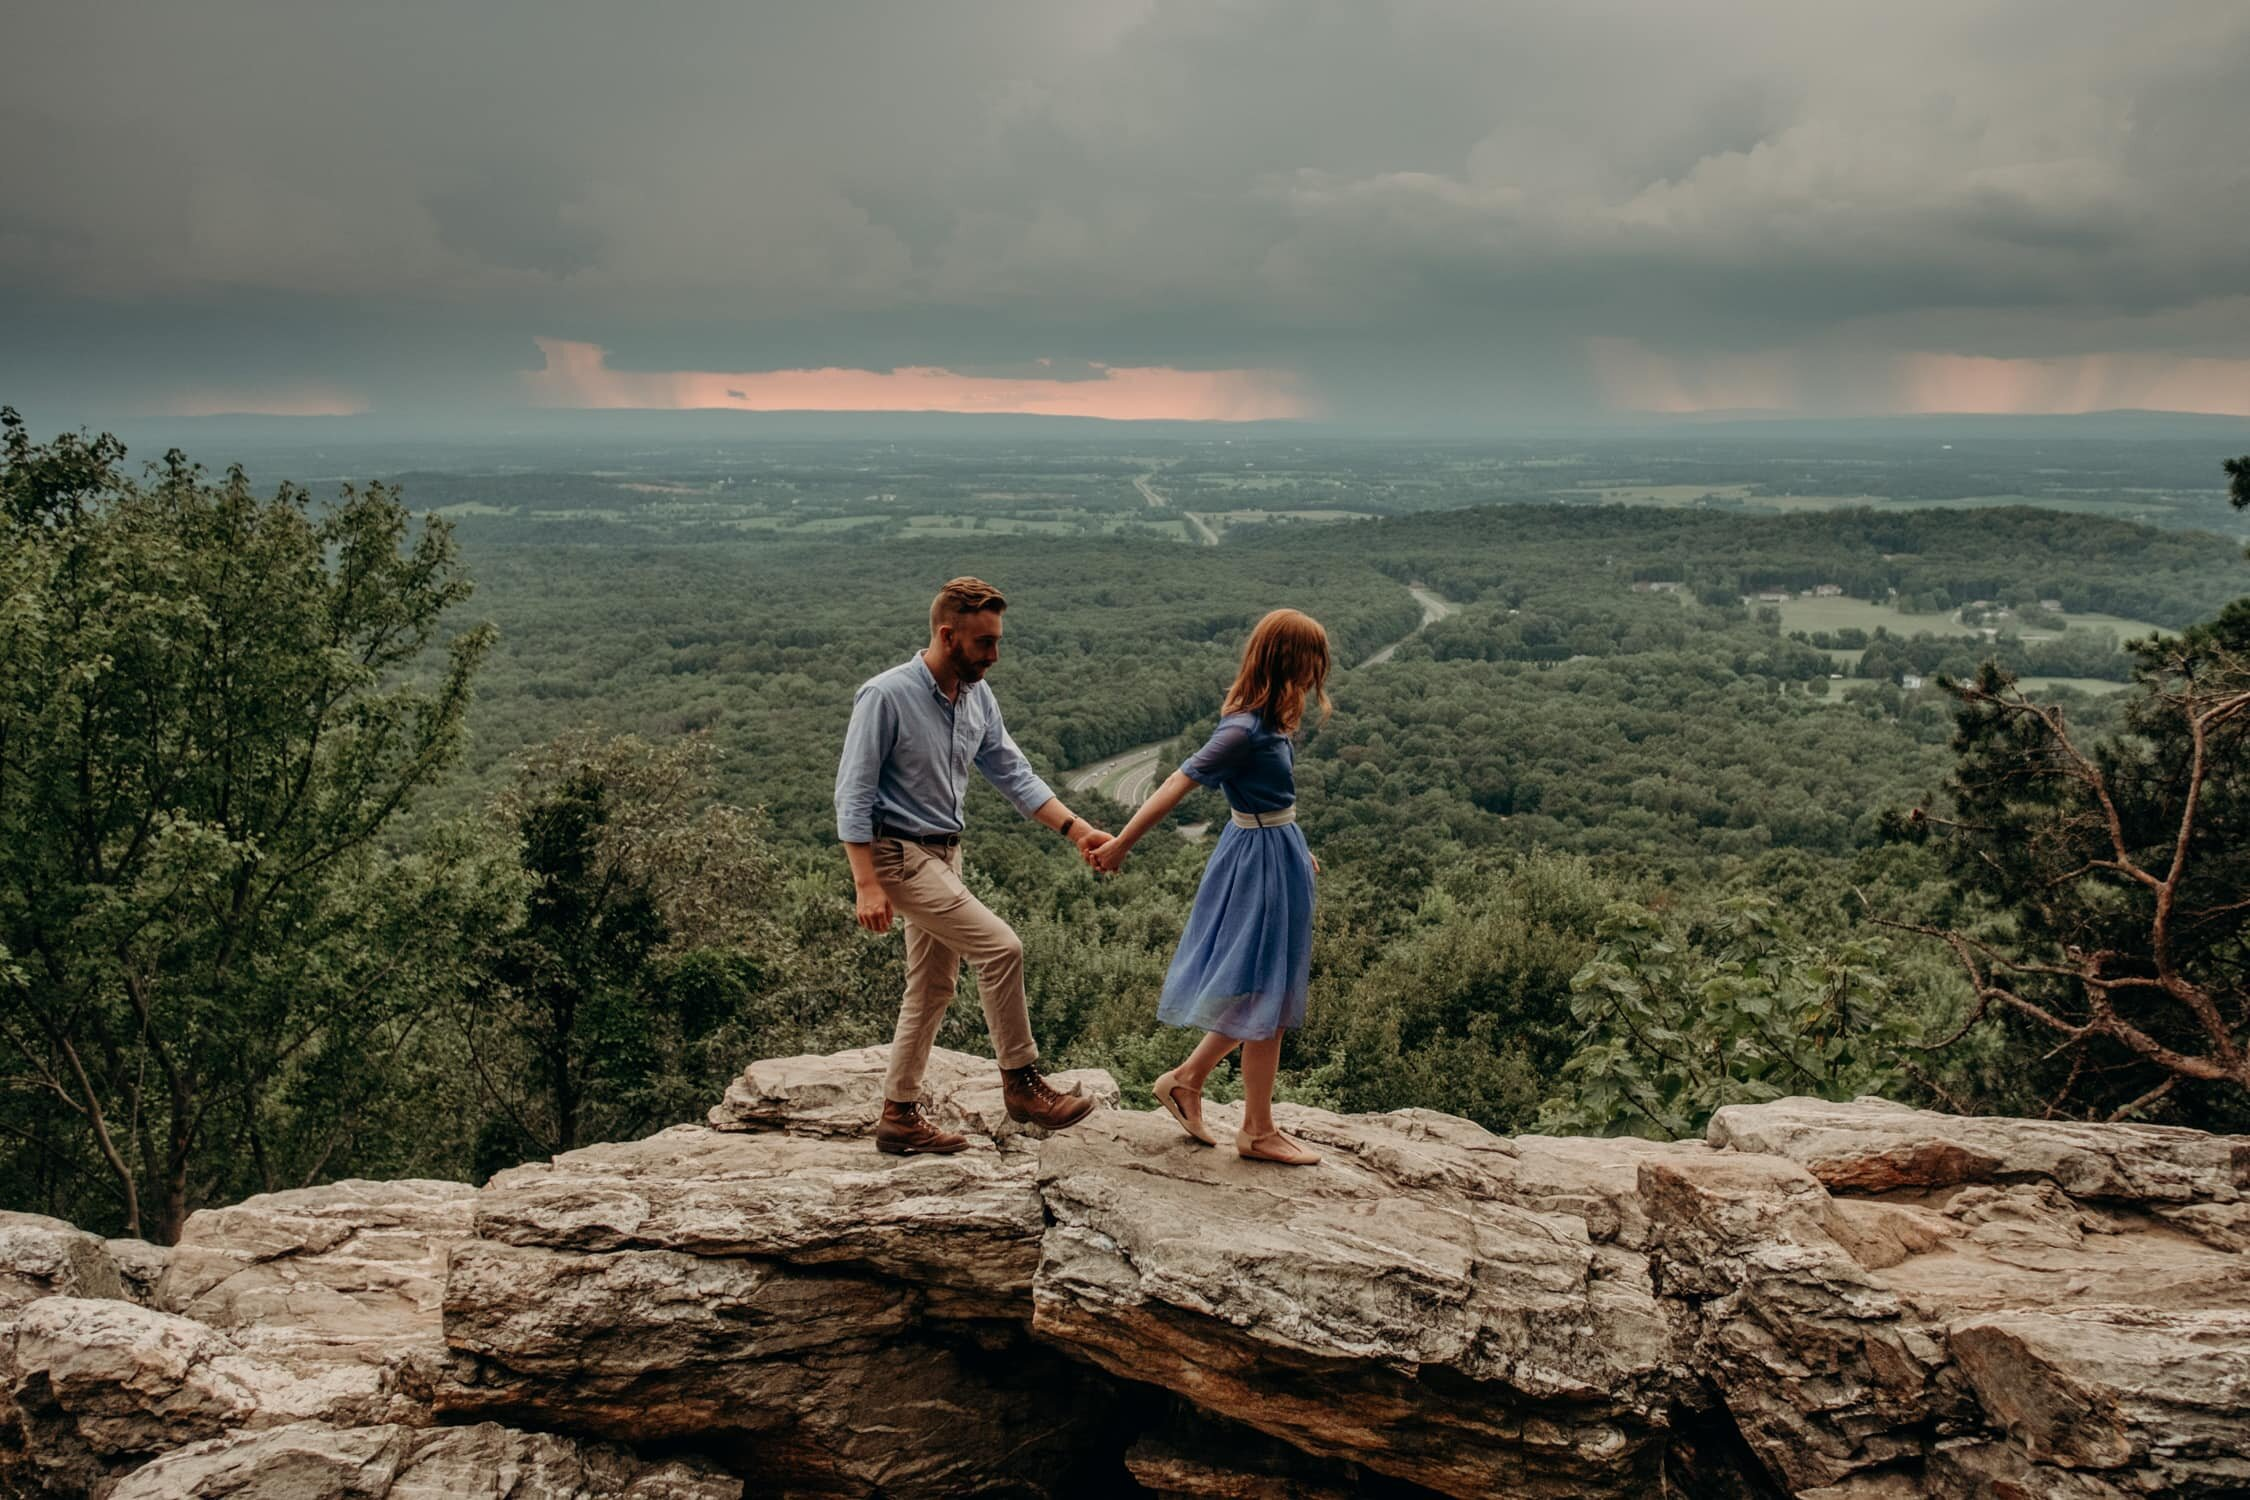 Couple walks along cliff overlooks holding hands at Bears Den Overlook